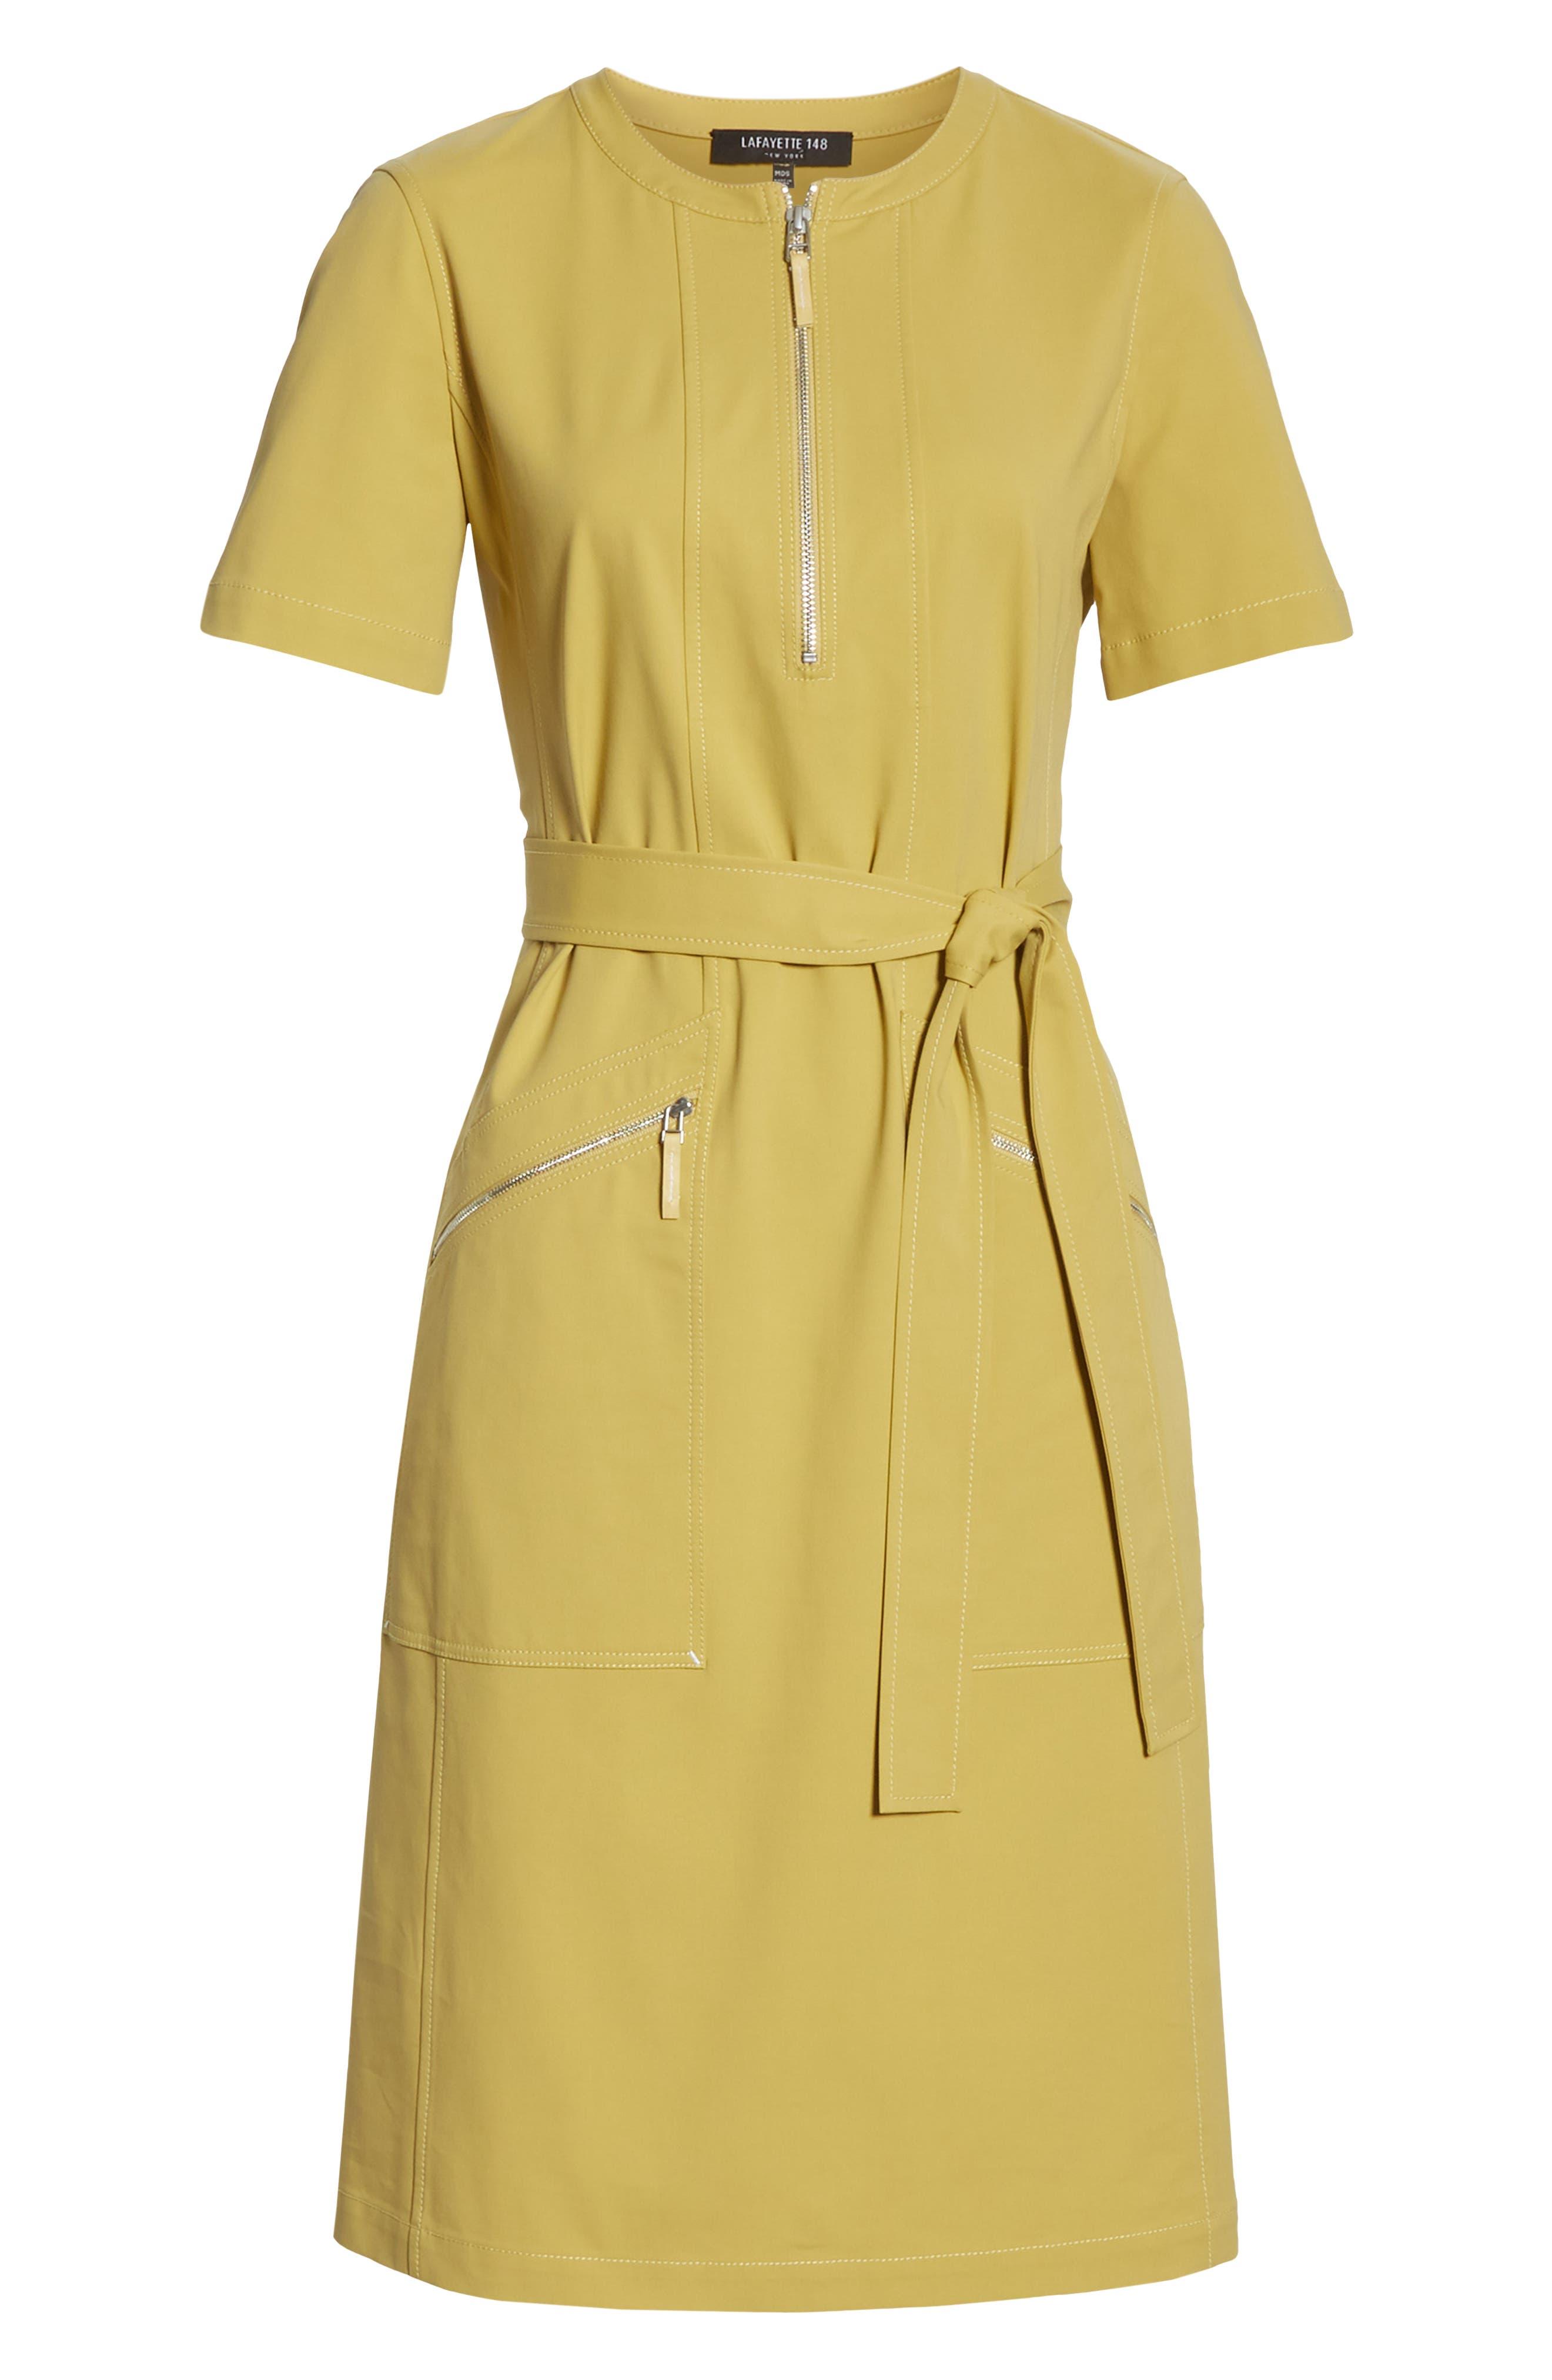 LAFAYETTE 148 NEW YORK, Elizabella Belted Dress, Alternate thumbnail 8, color, GREEN TEA